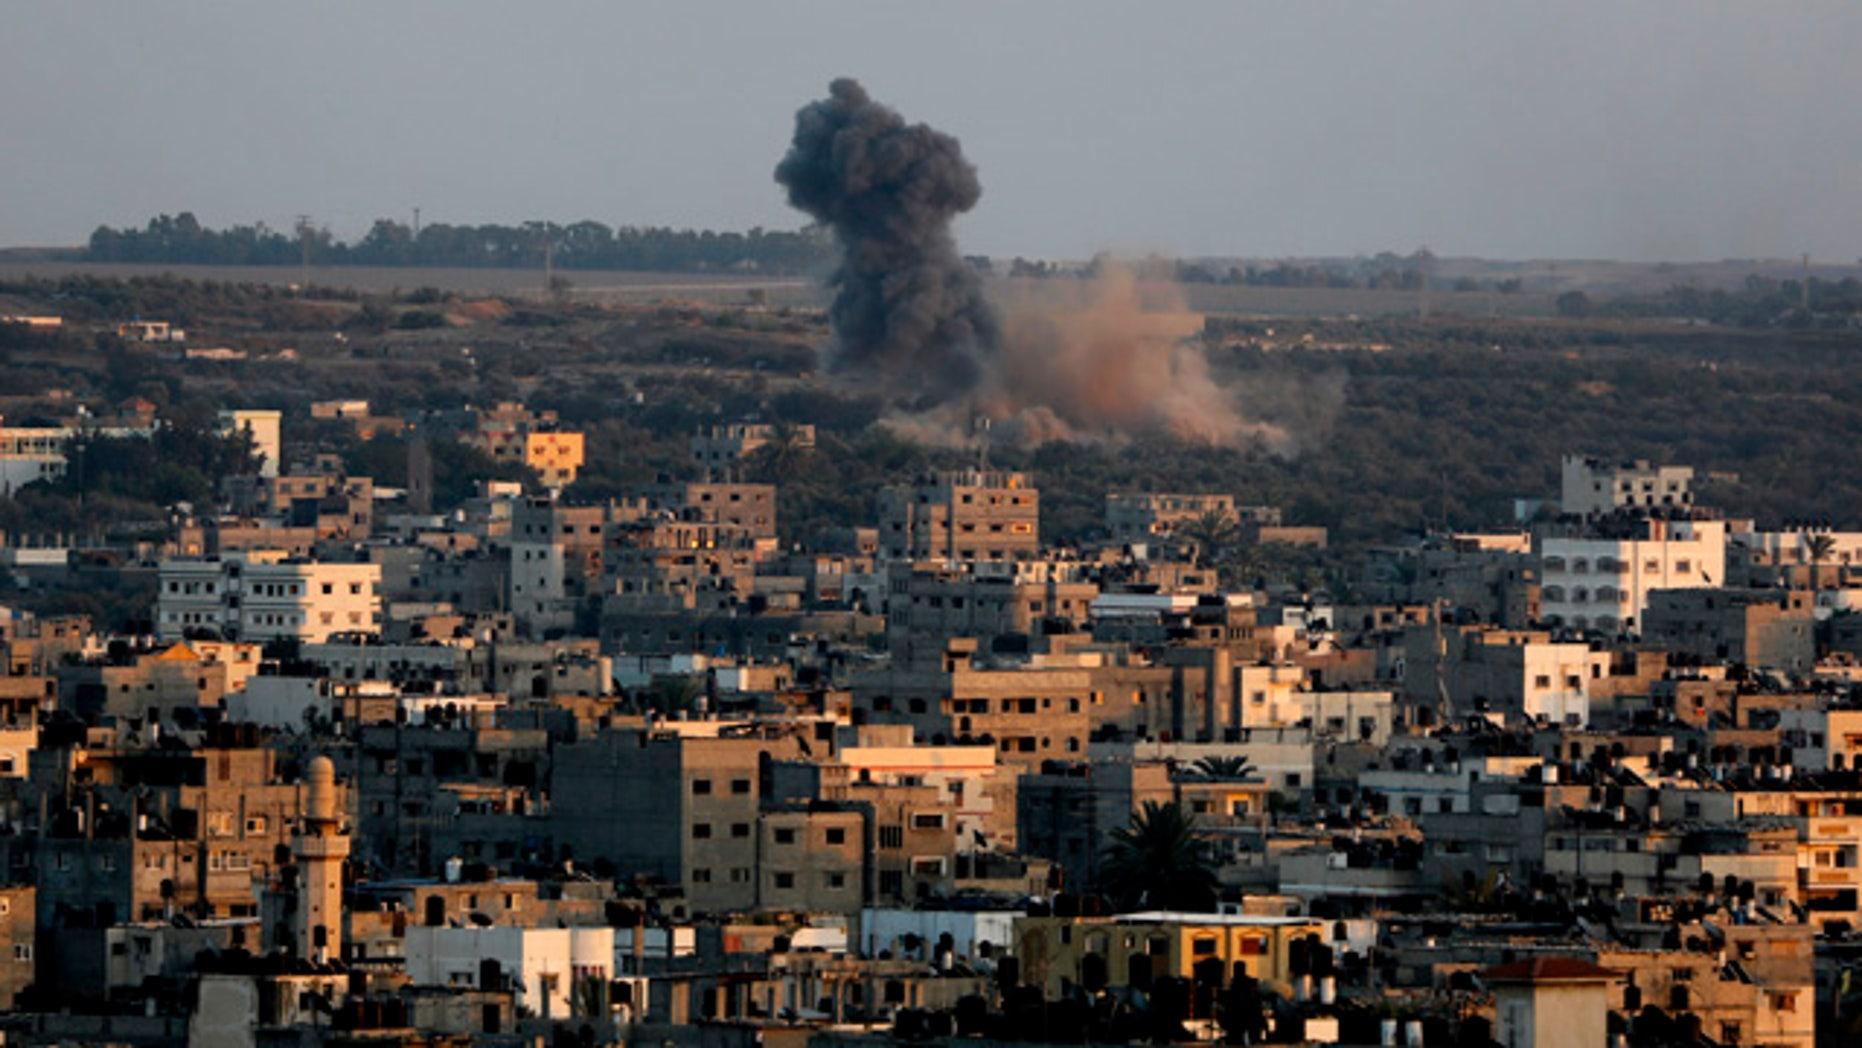 August 19, 2014: Smoke and dust rise after an Israeli strike hits Gaza City in the northern Gaza Strip. (AP Photo/Adel Hana)